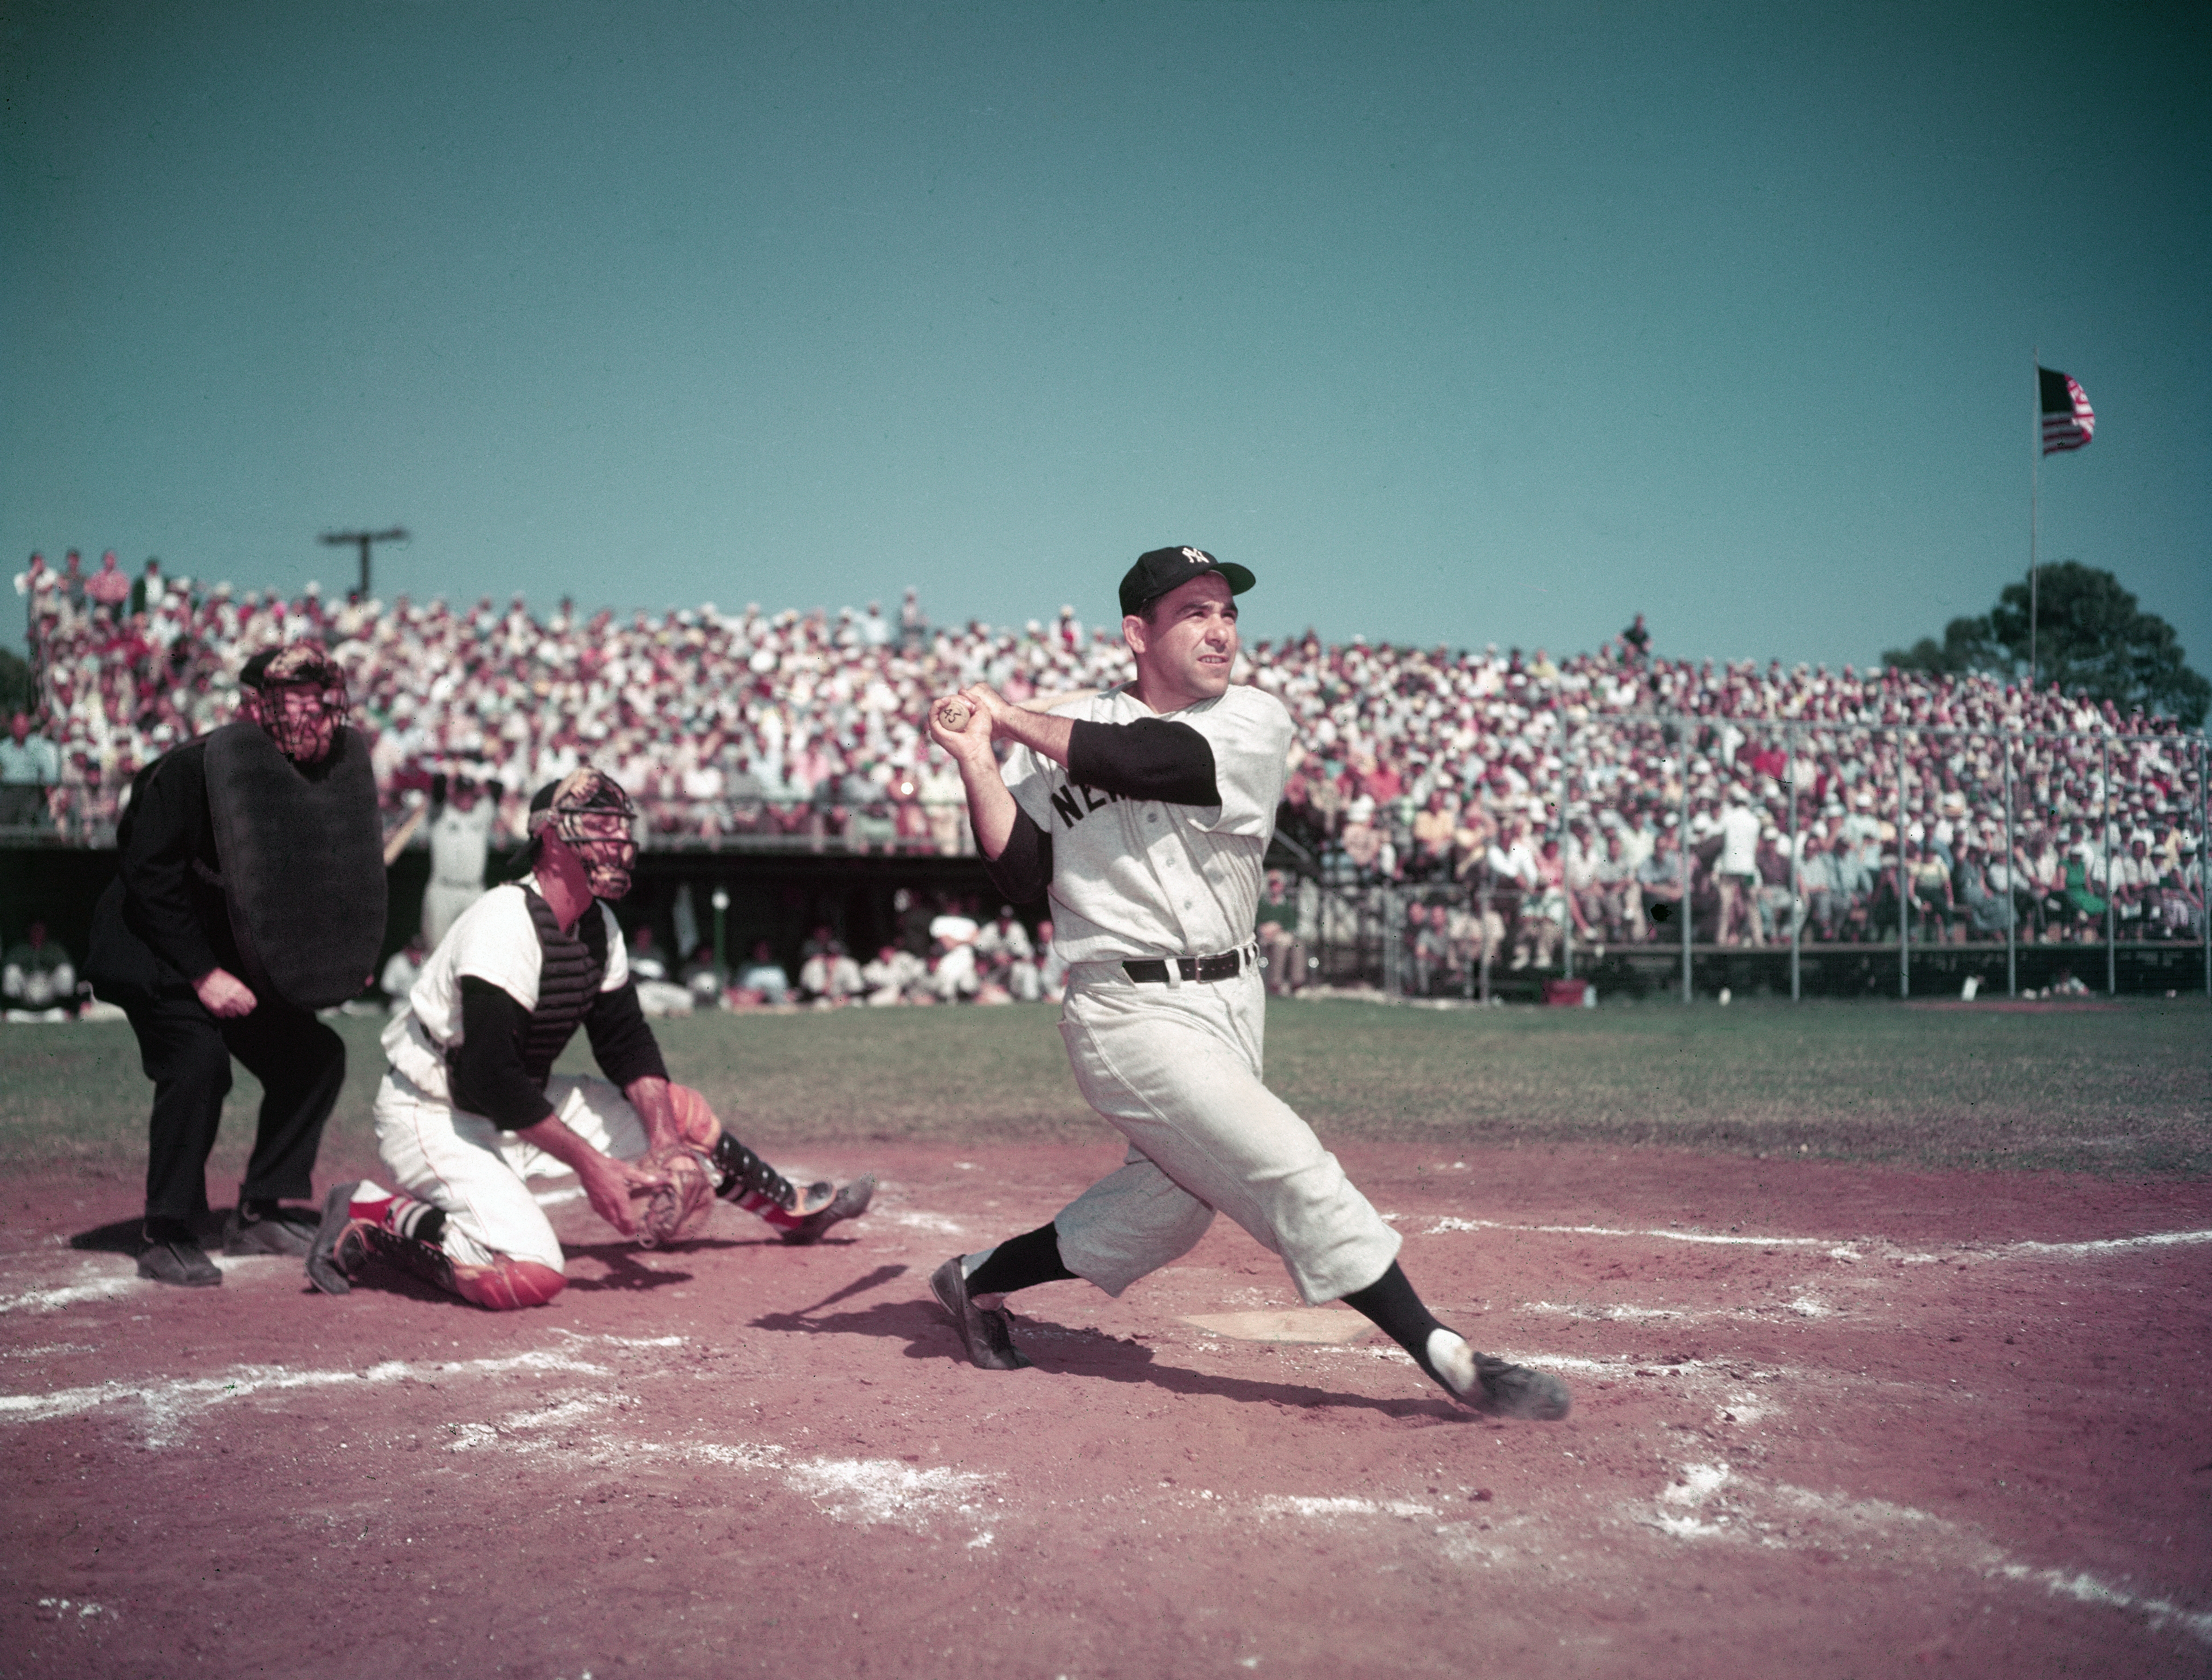 Yogi Berra, Yankees legend and Hall of Famer, passes away at age 90